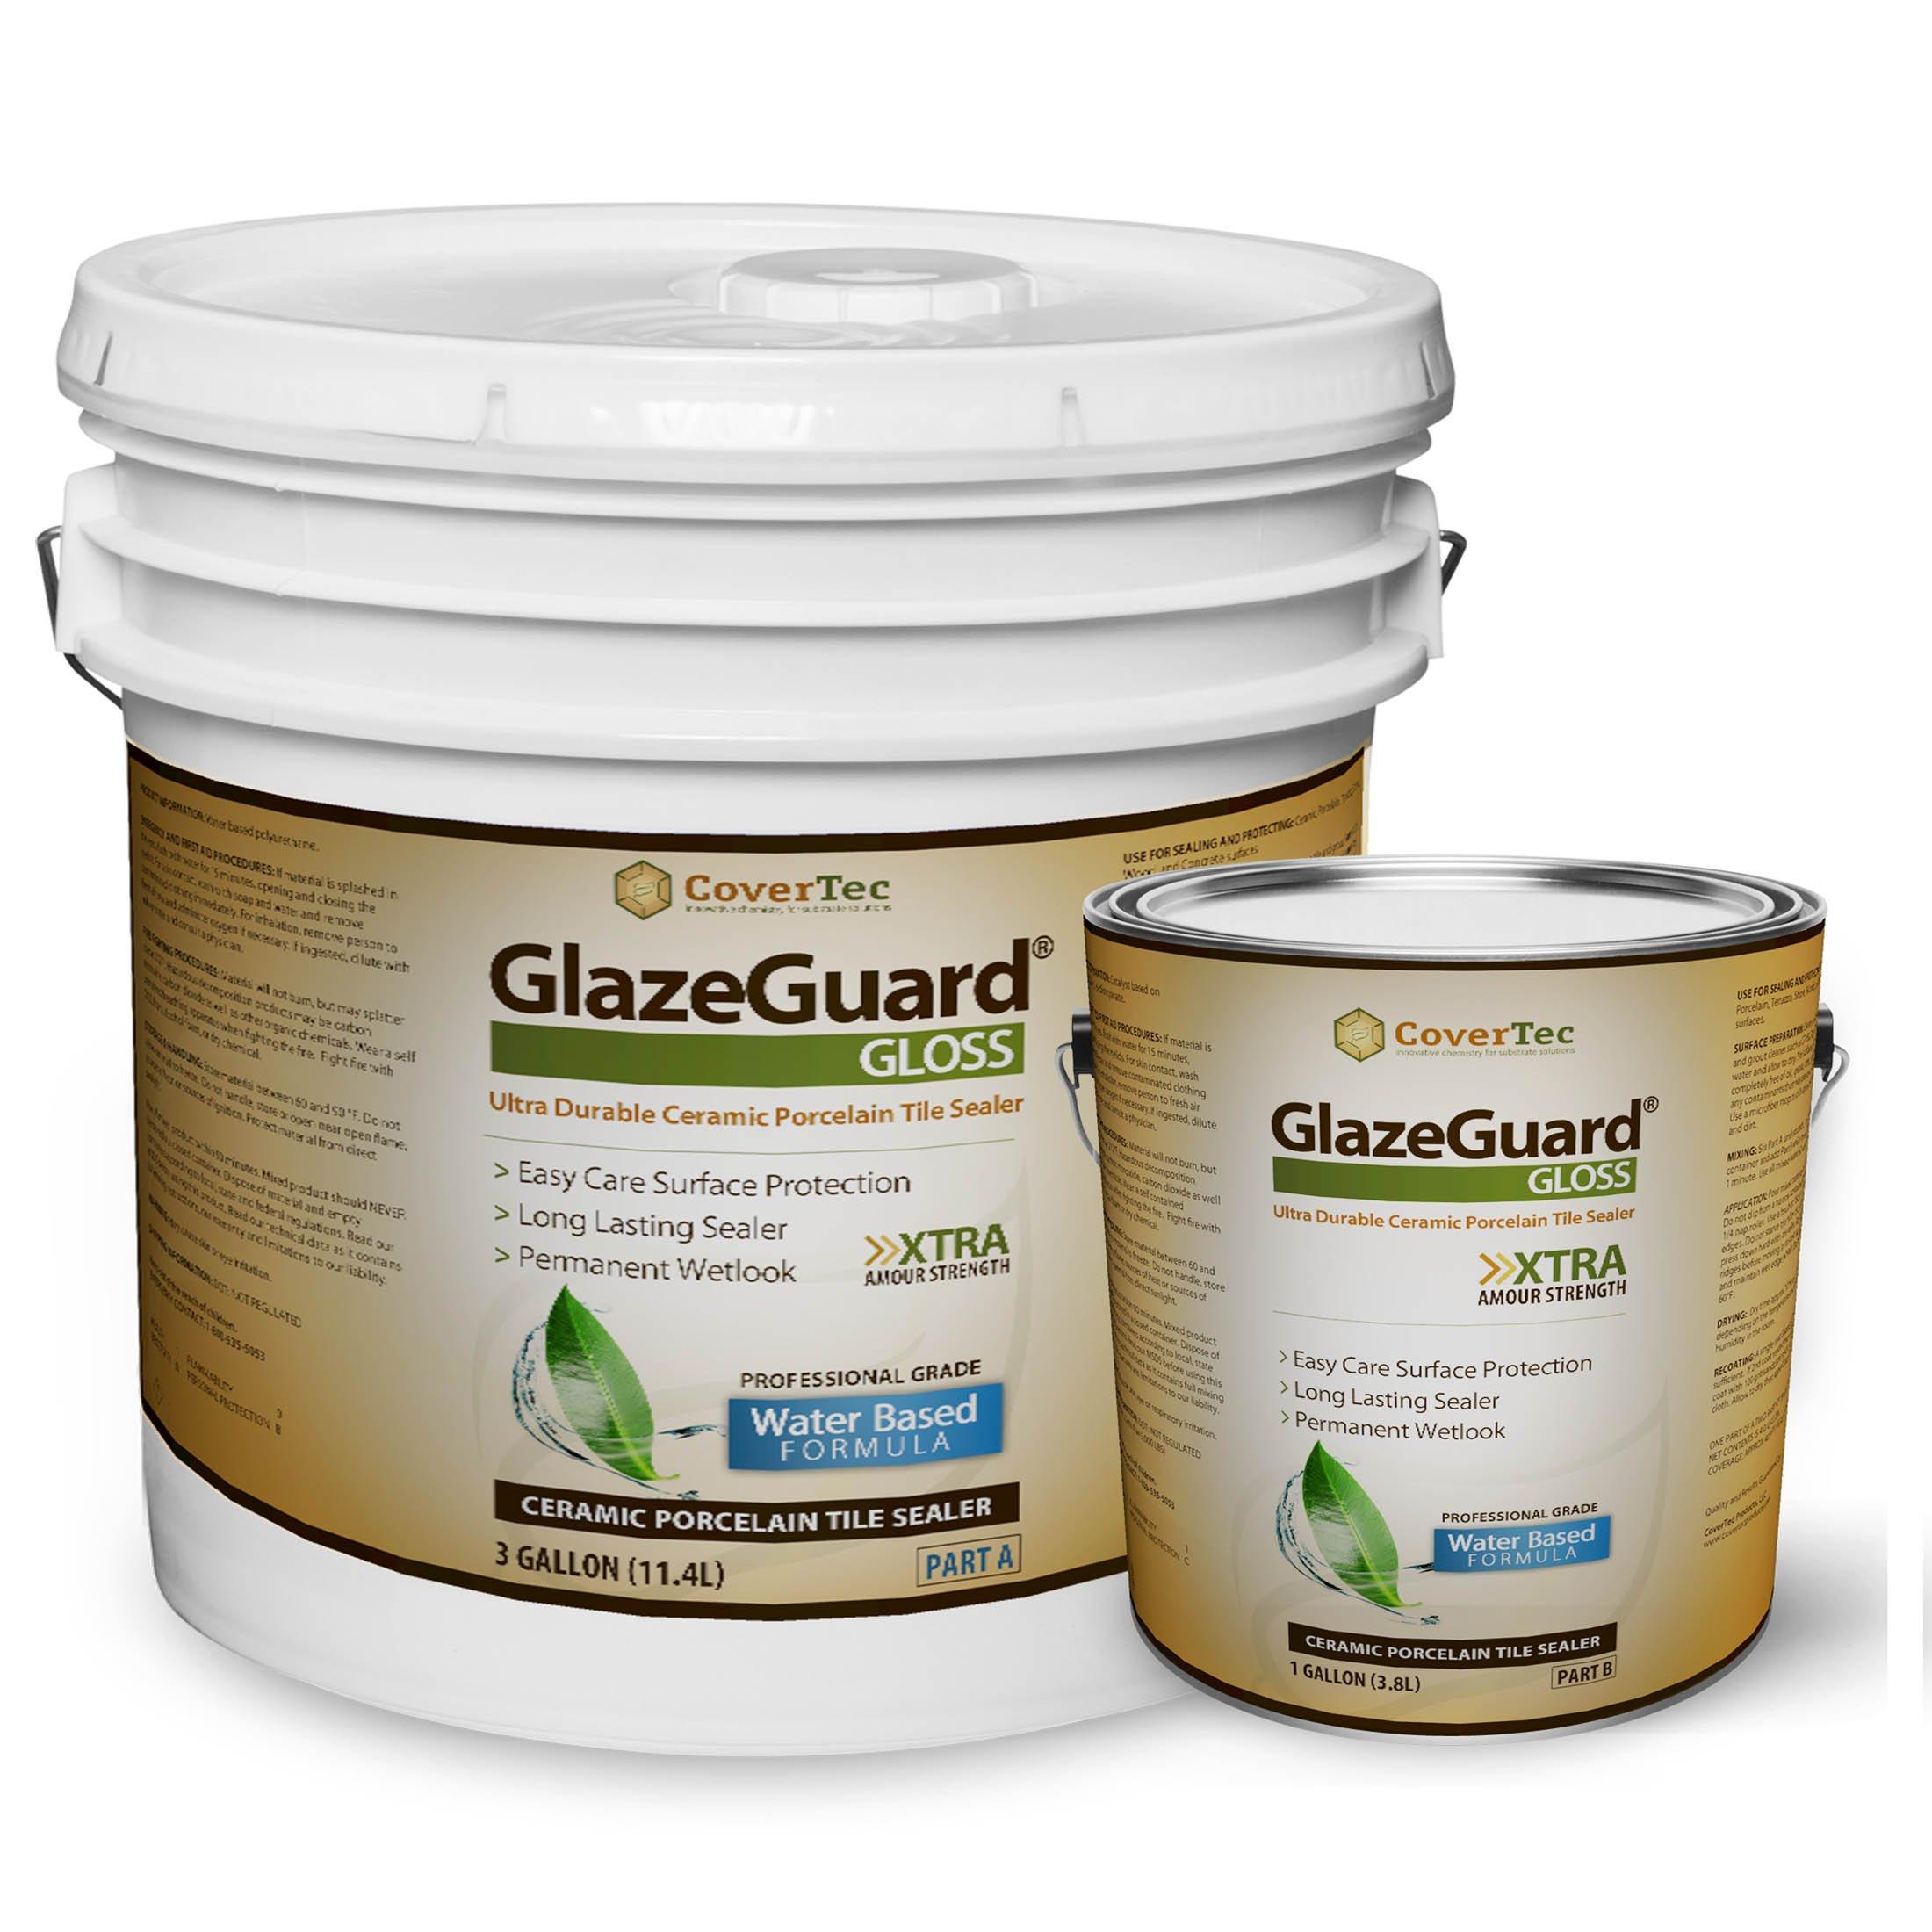 GlazeGuard Gloss Floor Sealer Wall Sealer for Ceramic, Porcelain, Stone Tile Surfaces (4 Gal - Prof Grade (2) Part Kit) by GlazeGuard by CoverTec